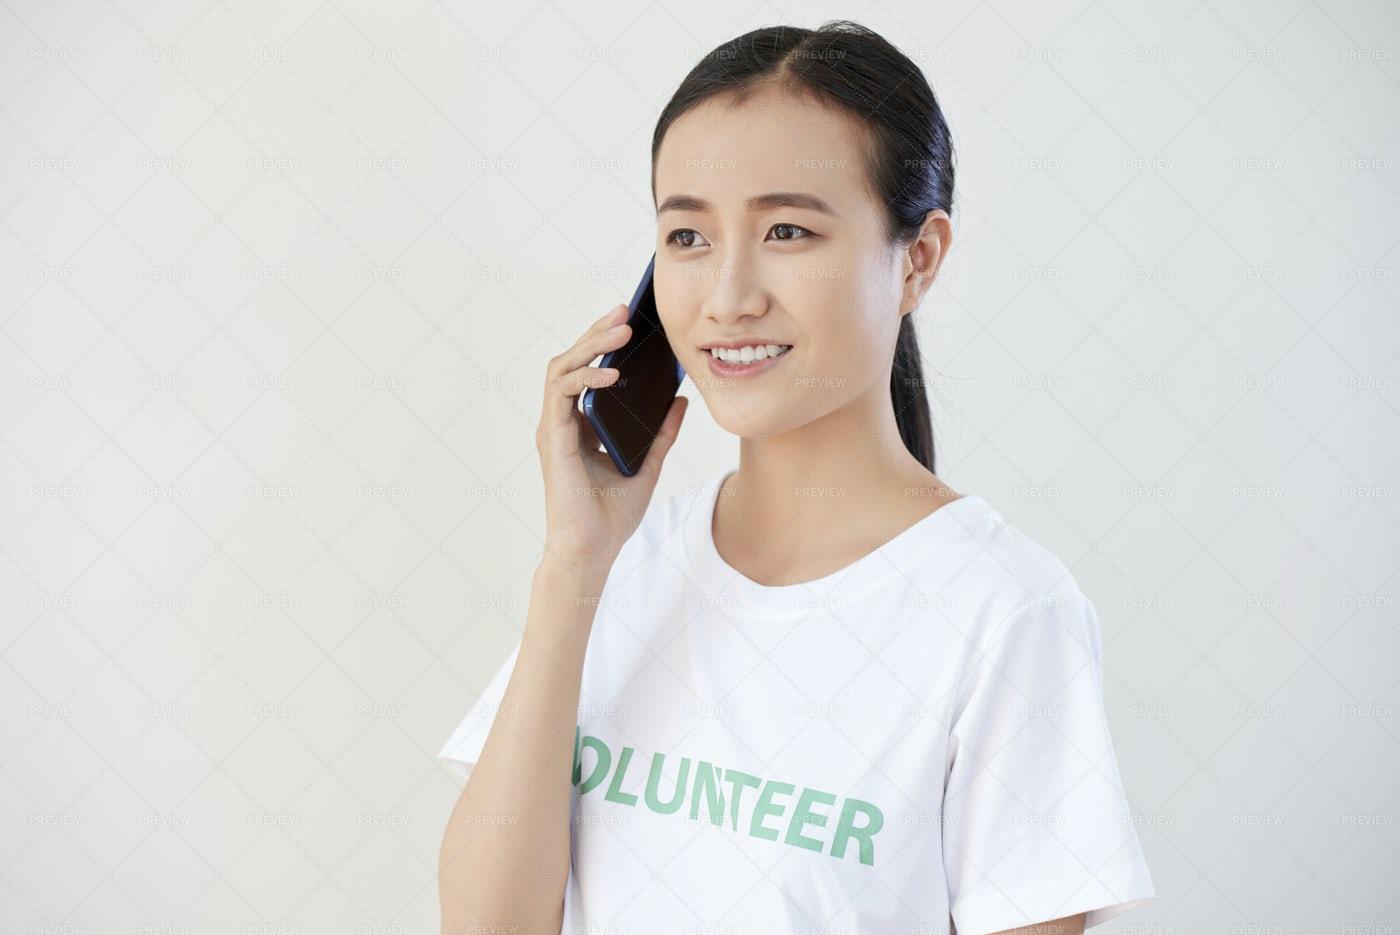 Volunteer Talking On Mobile Phone: Stock Photos